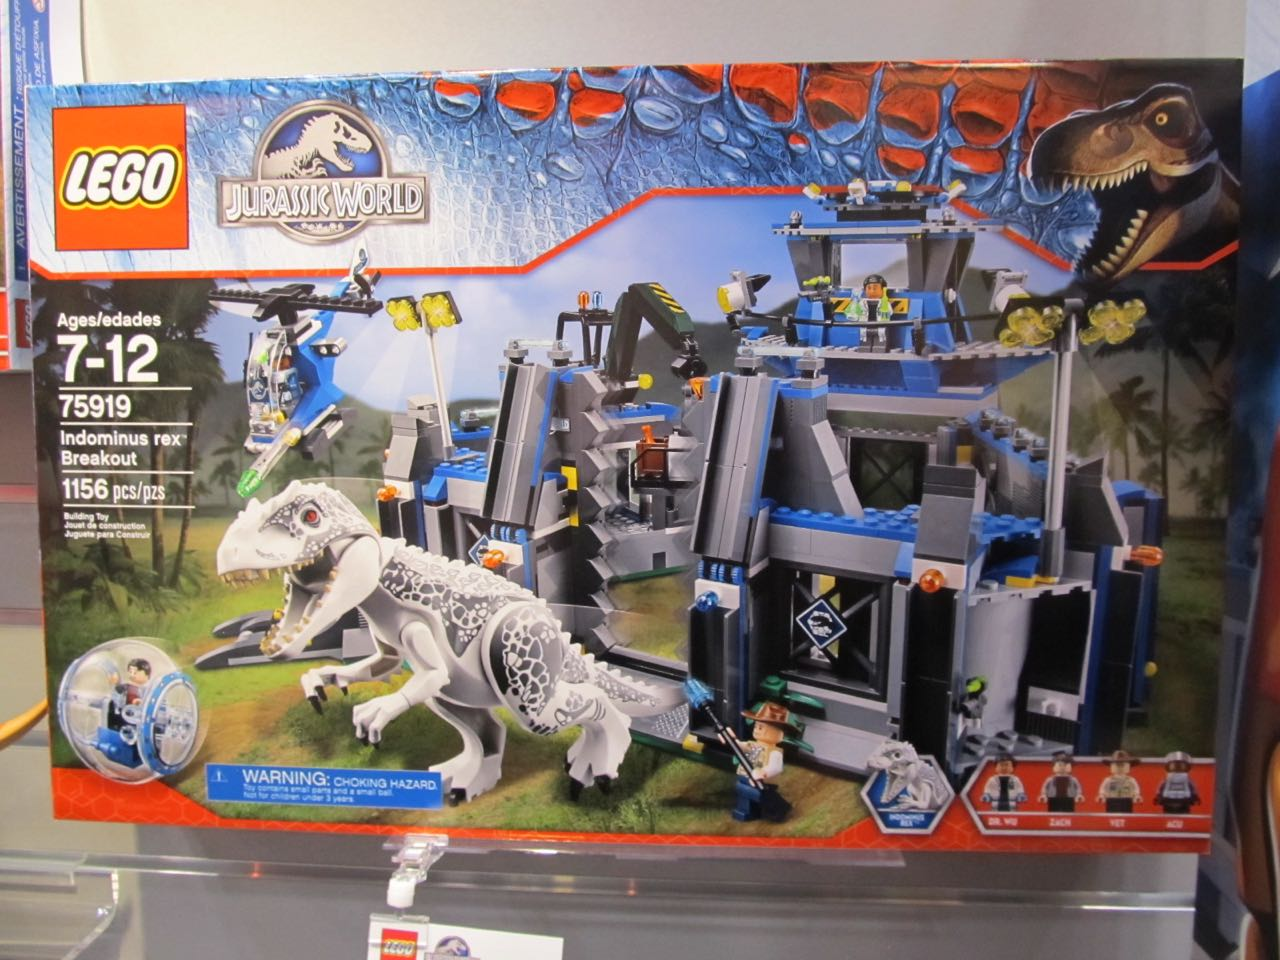 jurassic world lego sets - Jurassic Lego